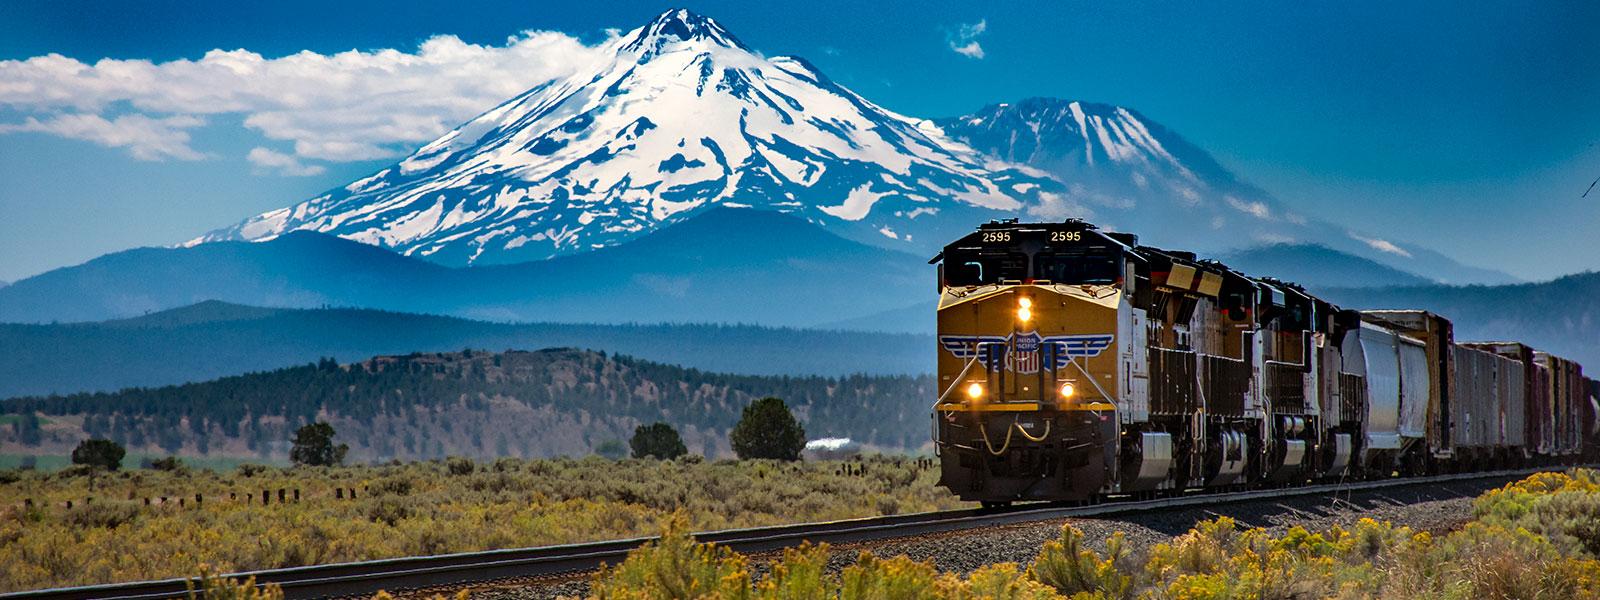 Mt Shasta Landscape with Train